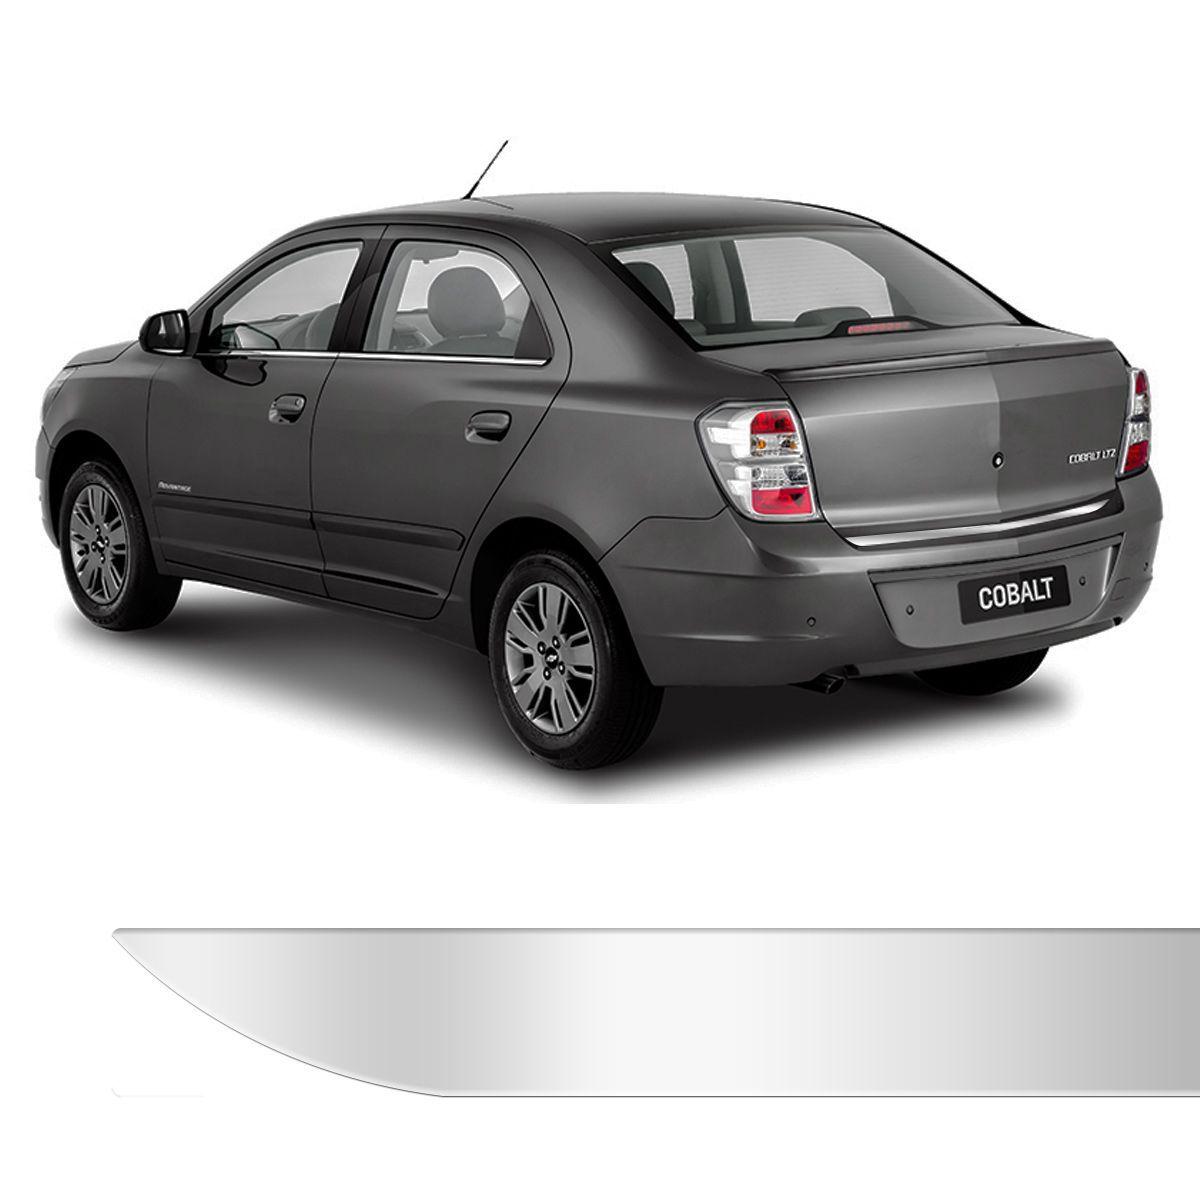 Friso Porta Malas Chevrolet Cobalt Cromado Resinado